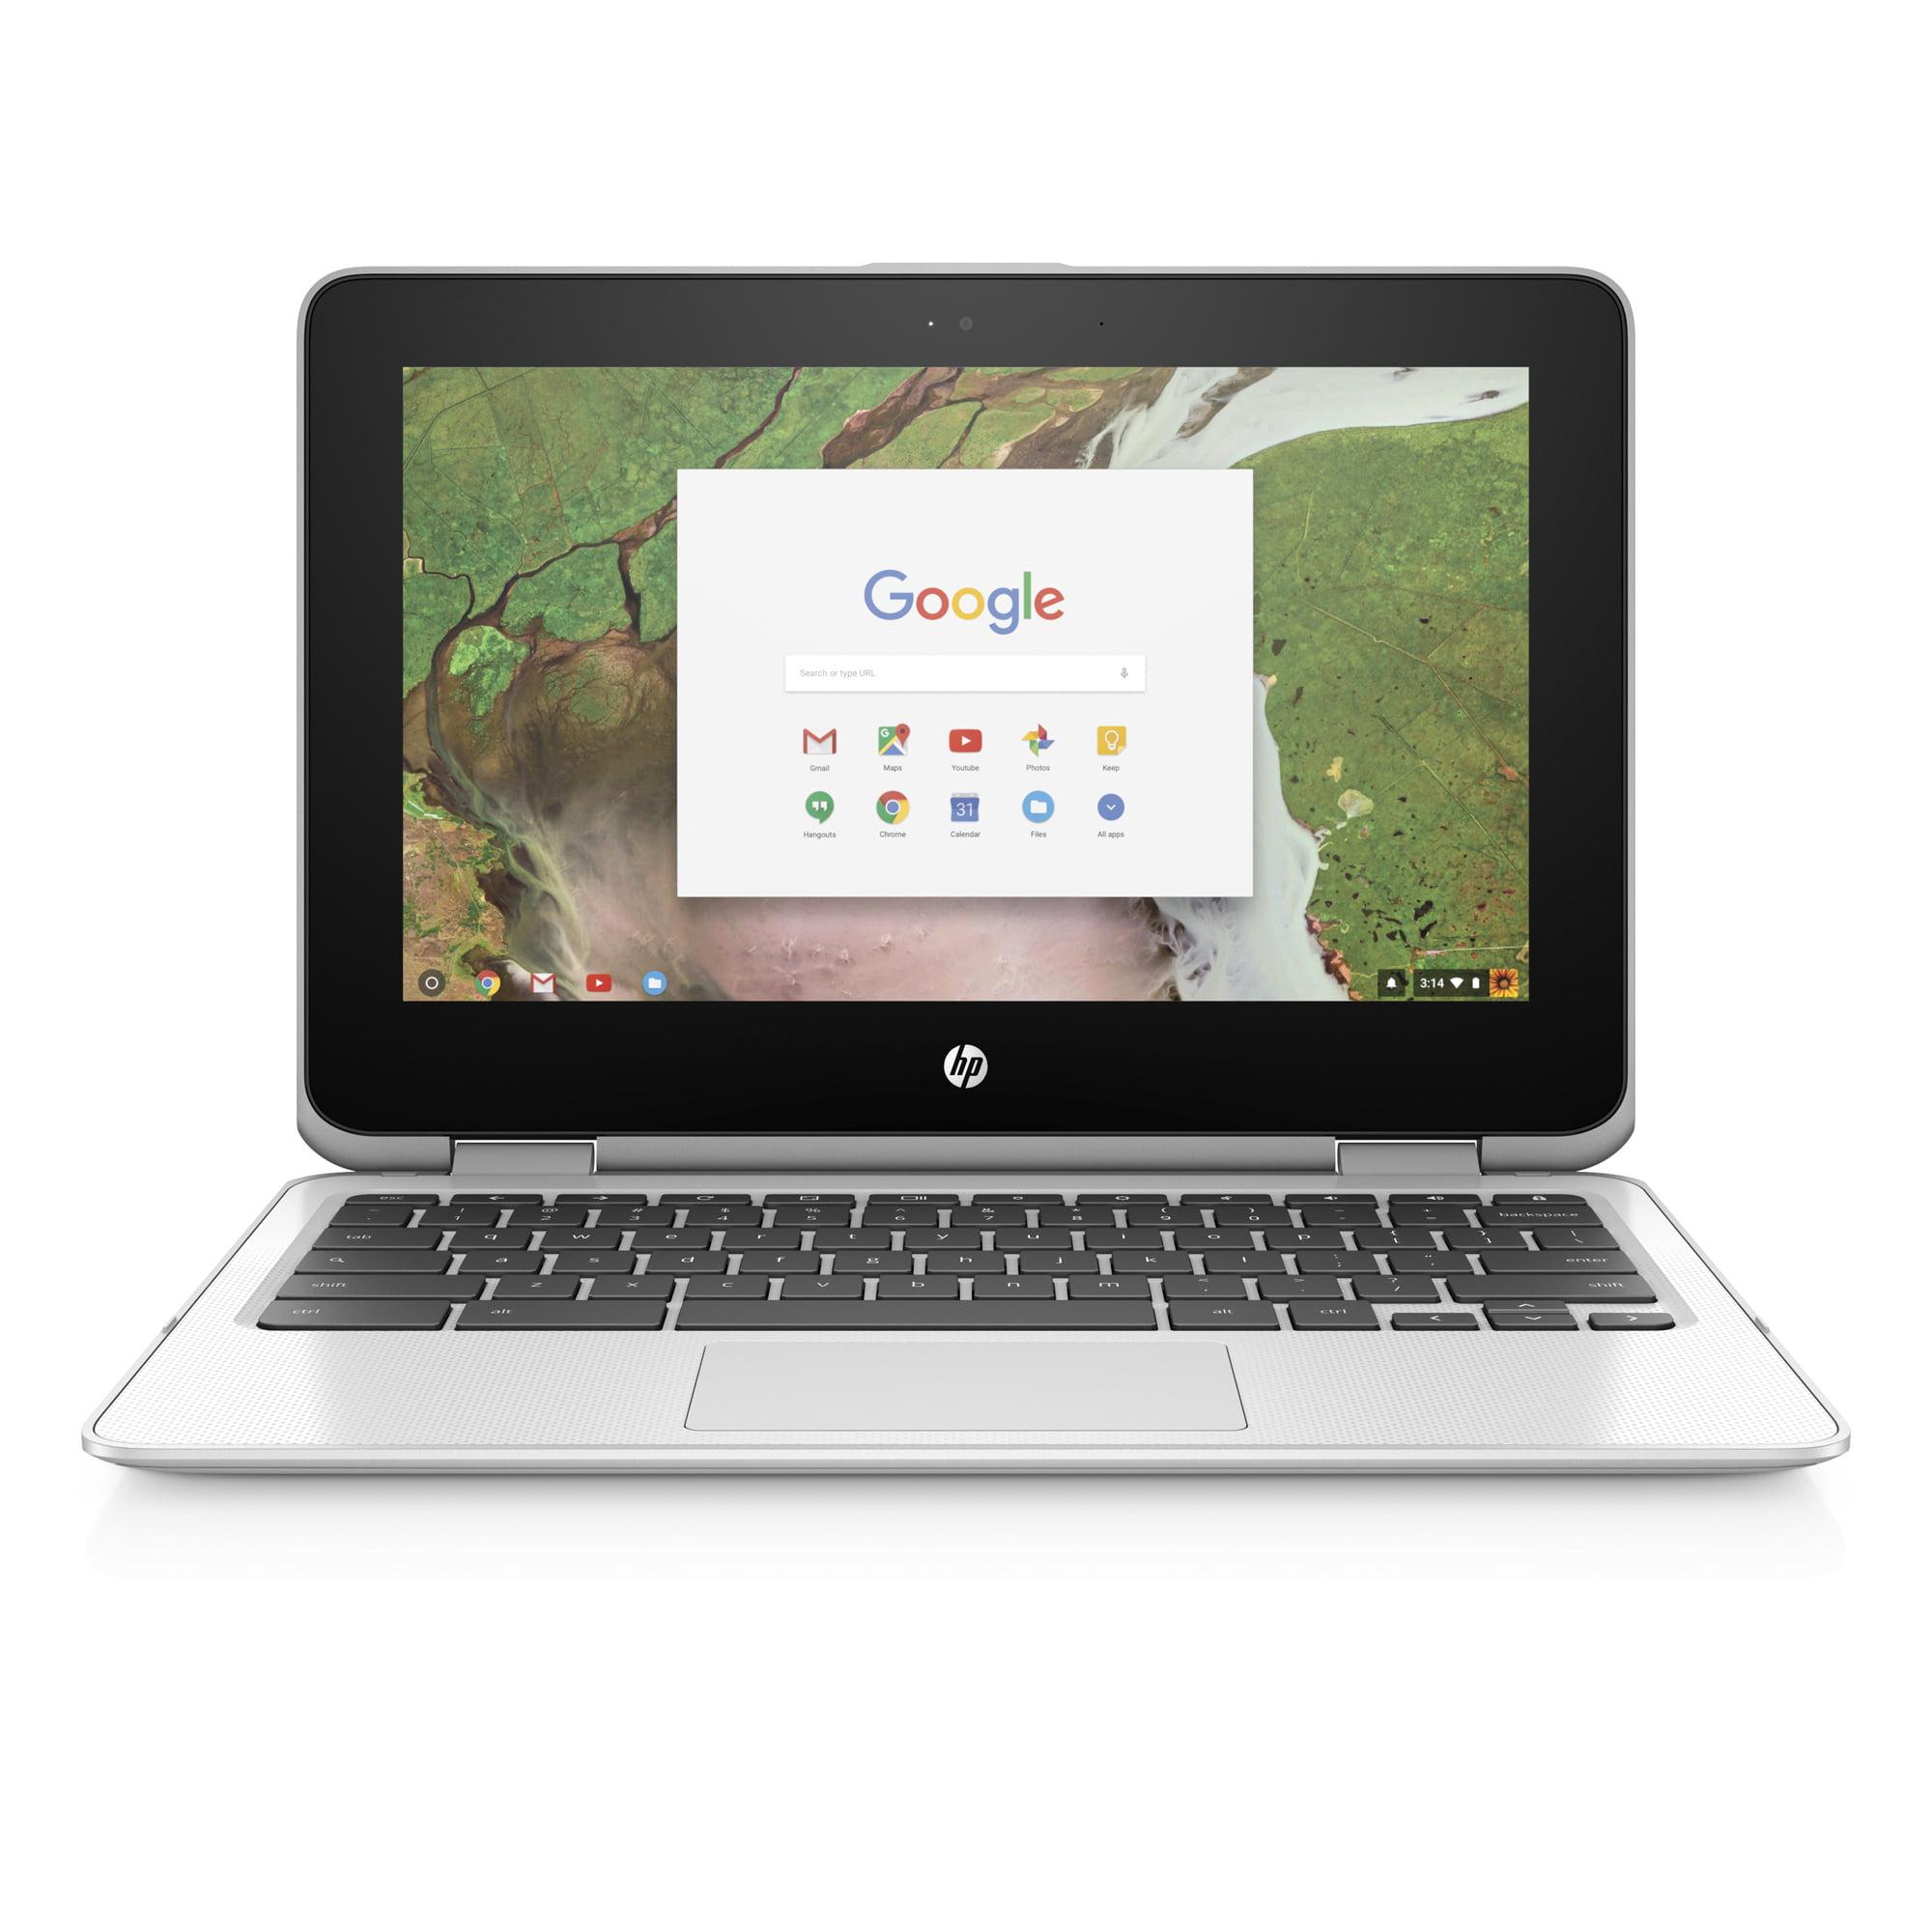 HP CHROMEBOOK X360 11-AE110NR, Intel Celeron N3350, Intel HD Graphics 500, 32GB eMMC, 4GB LPDDR4, 4SH02UA#ABA